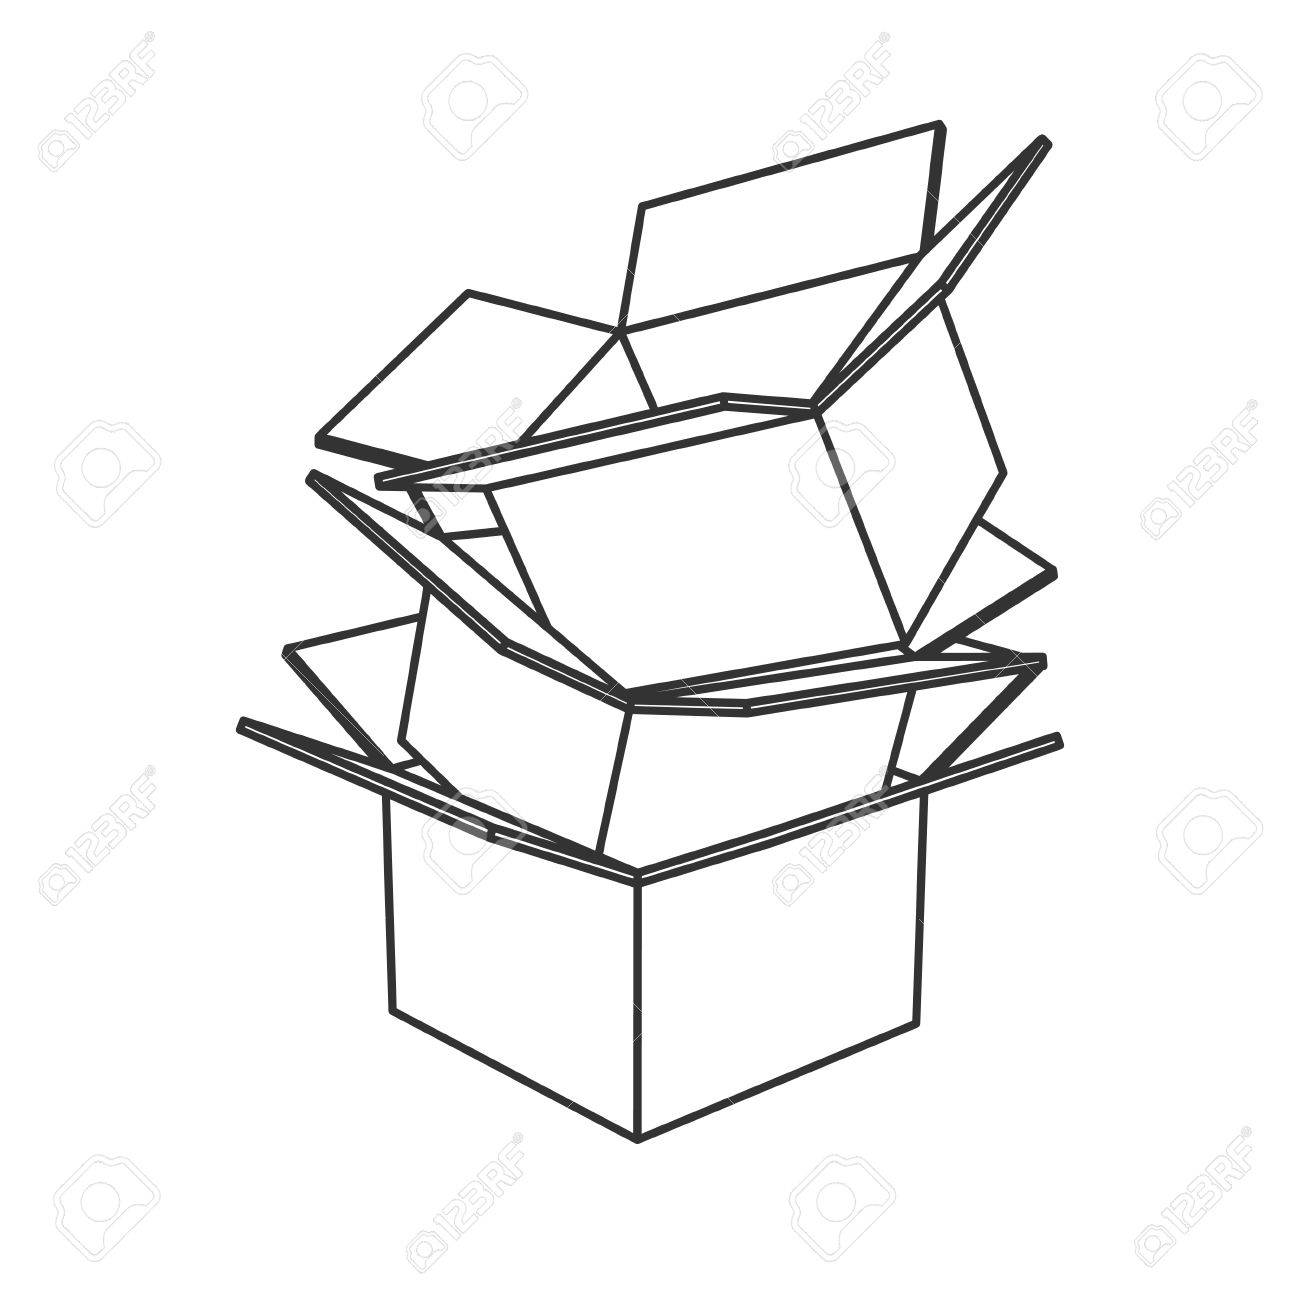 Cardboard Box Drawing At Getdrawings